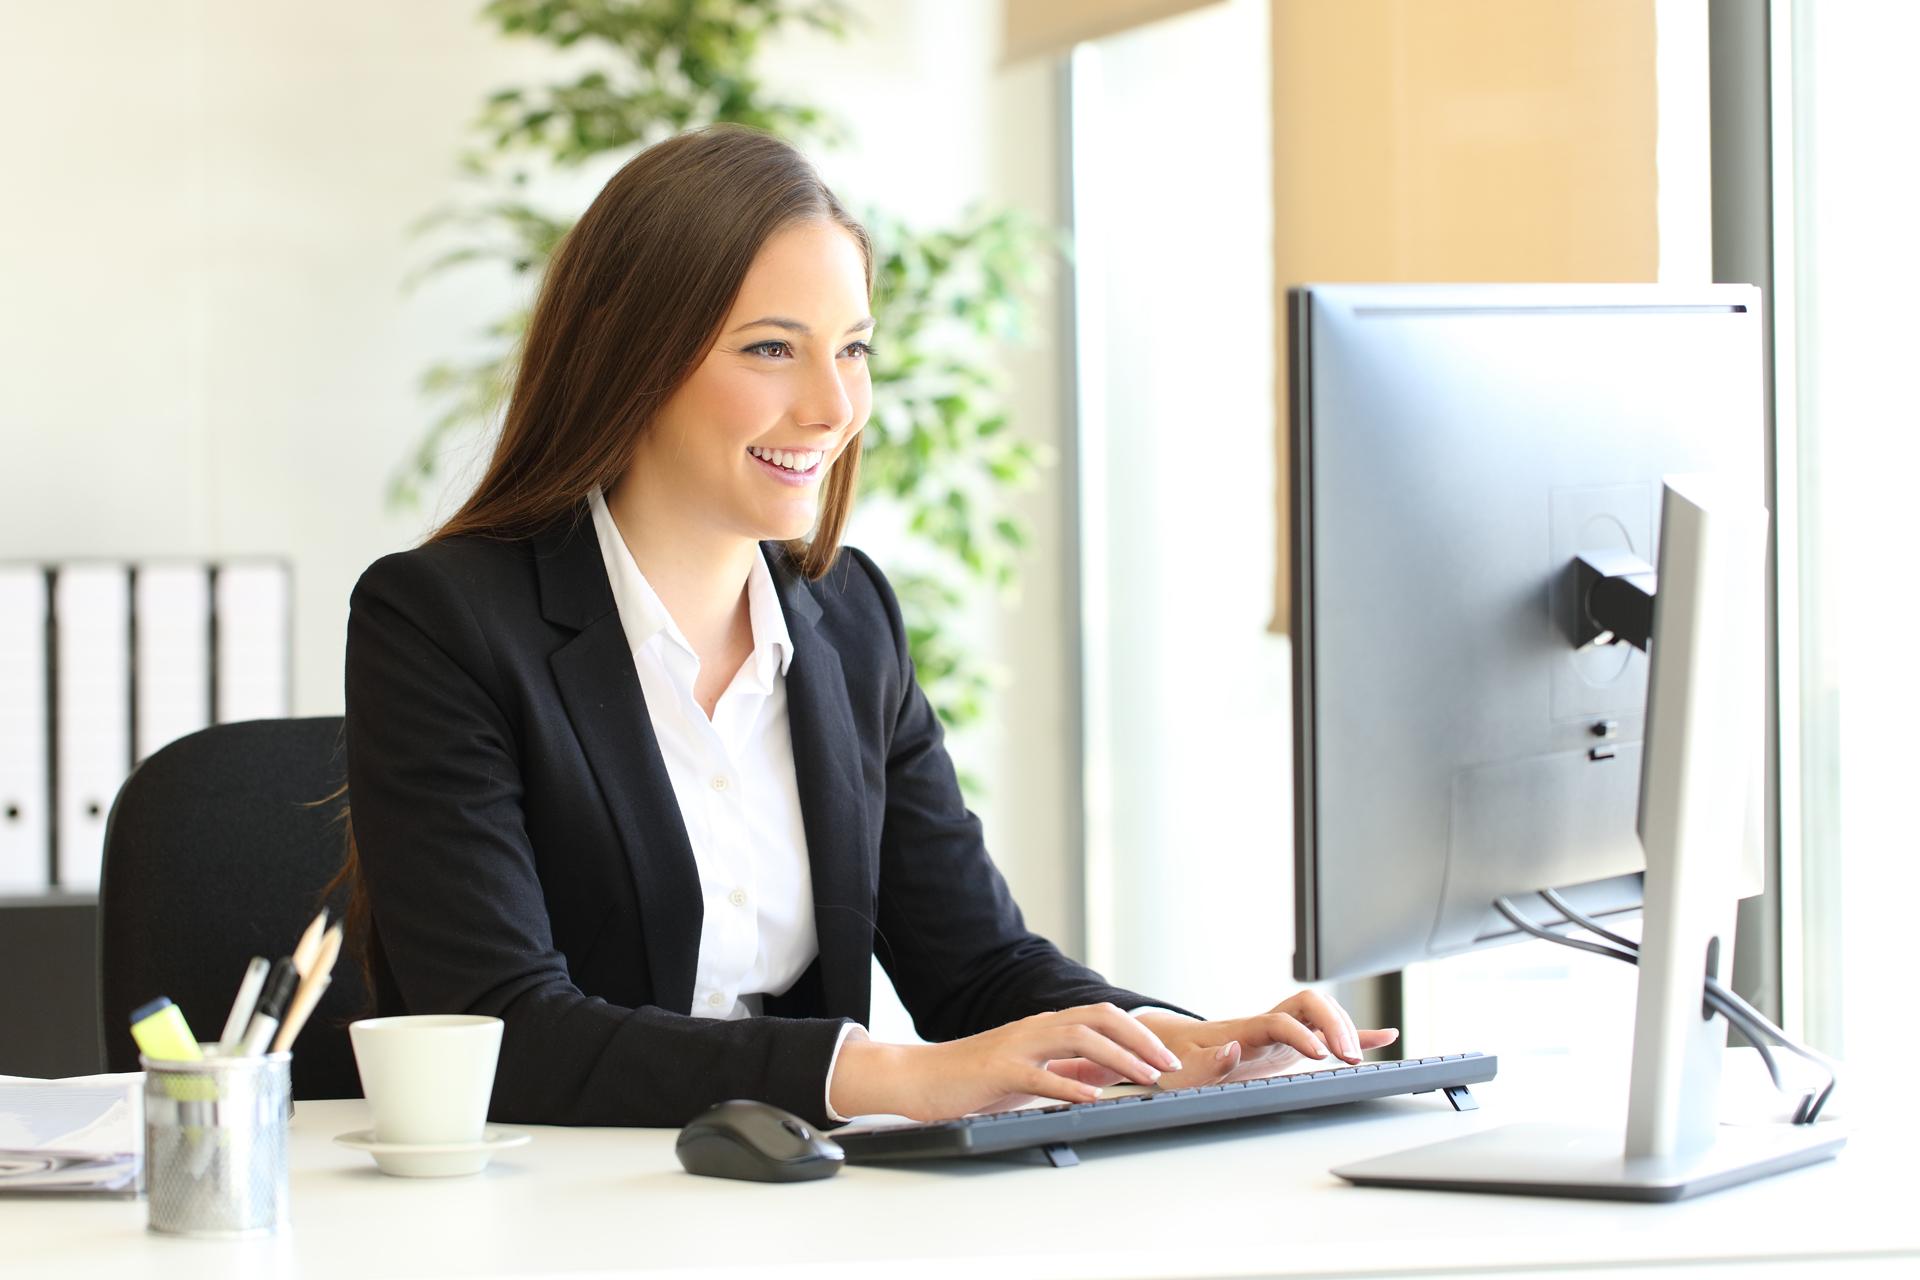 Kaufmann Frau Büromanagement